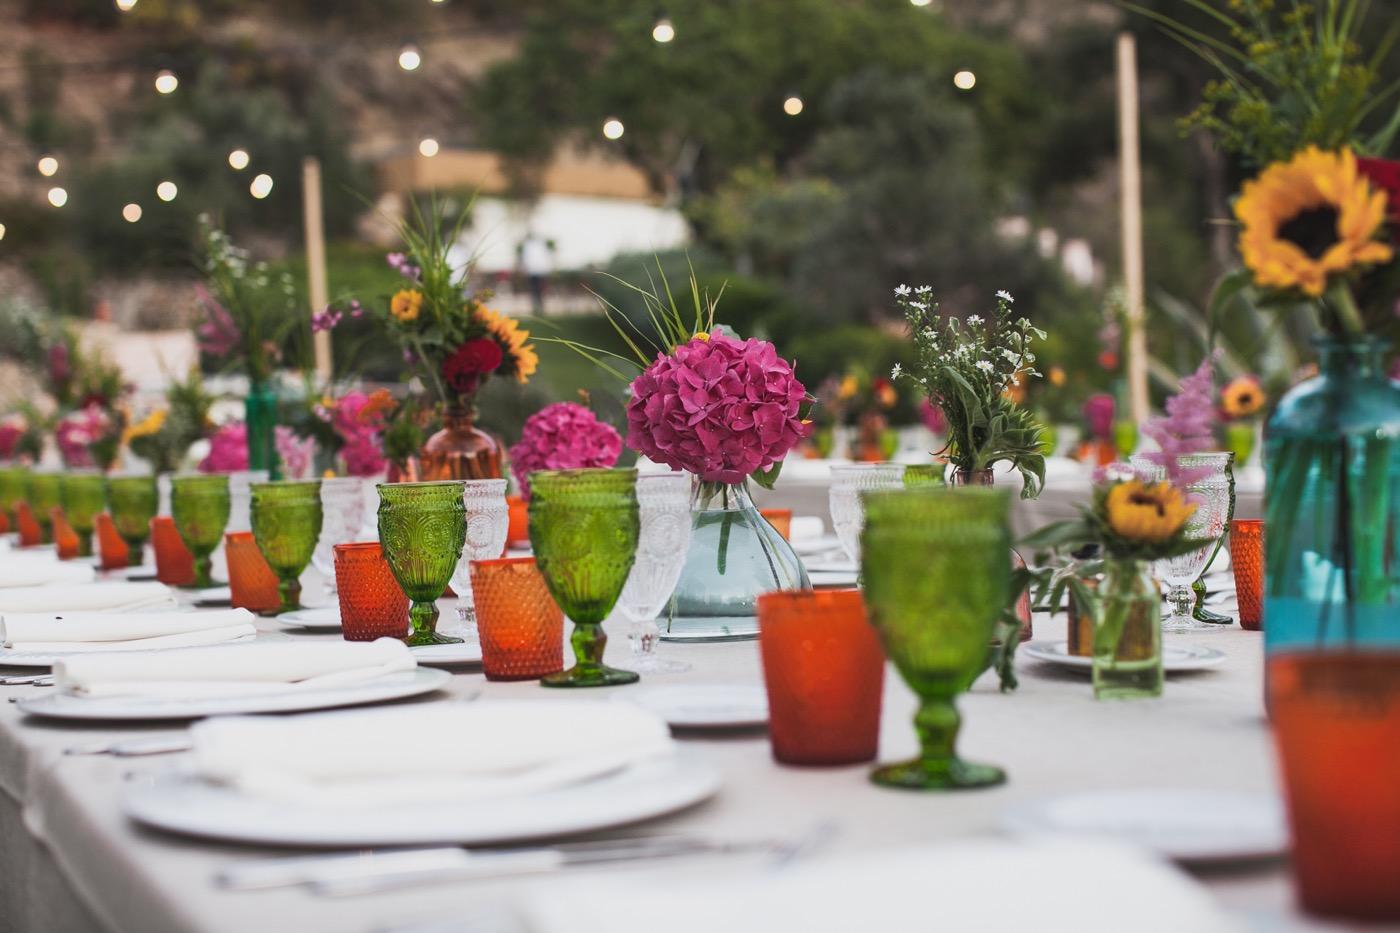 Si-Quiero-Wedding-Planner-By-Sira-Antequera-Bodas-Málaga-Marbella-Miami- PATRICIA-JUANLU-2